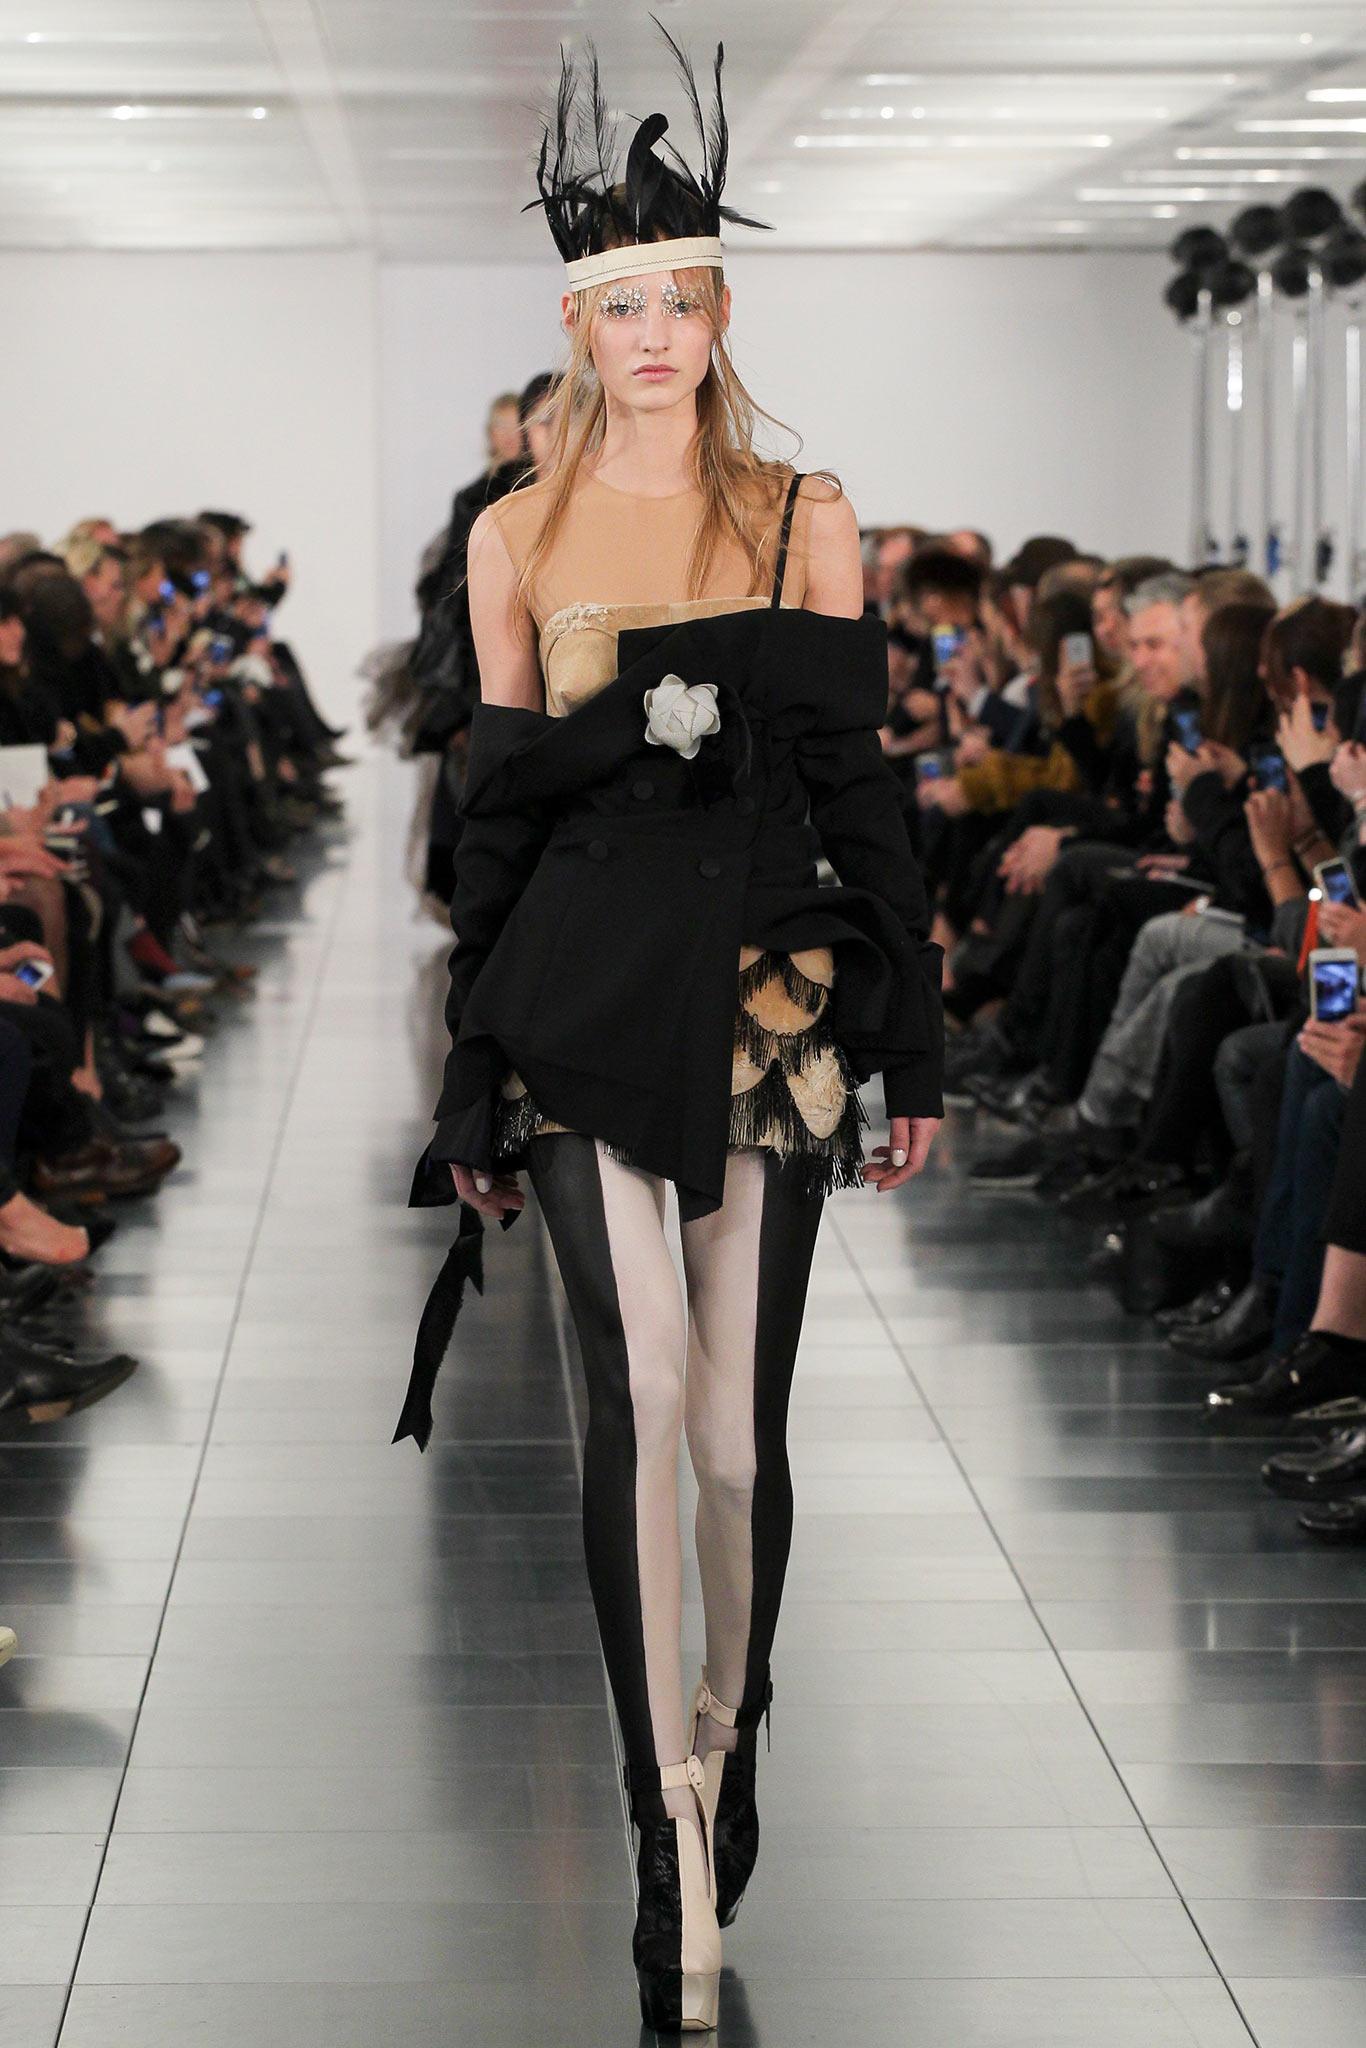 Fashion brand Maison Martin Margiela: customer reviews 84